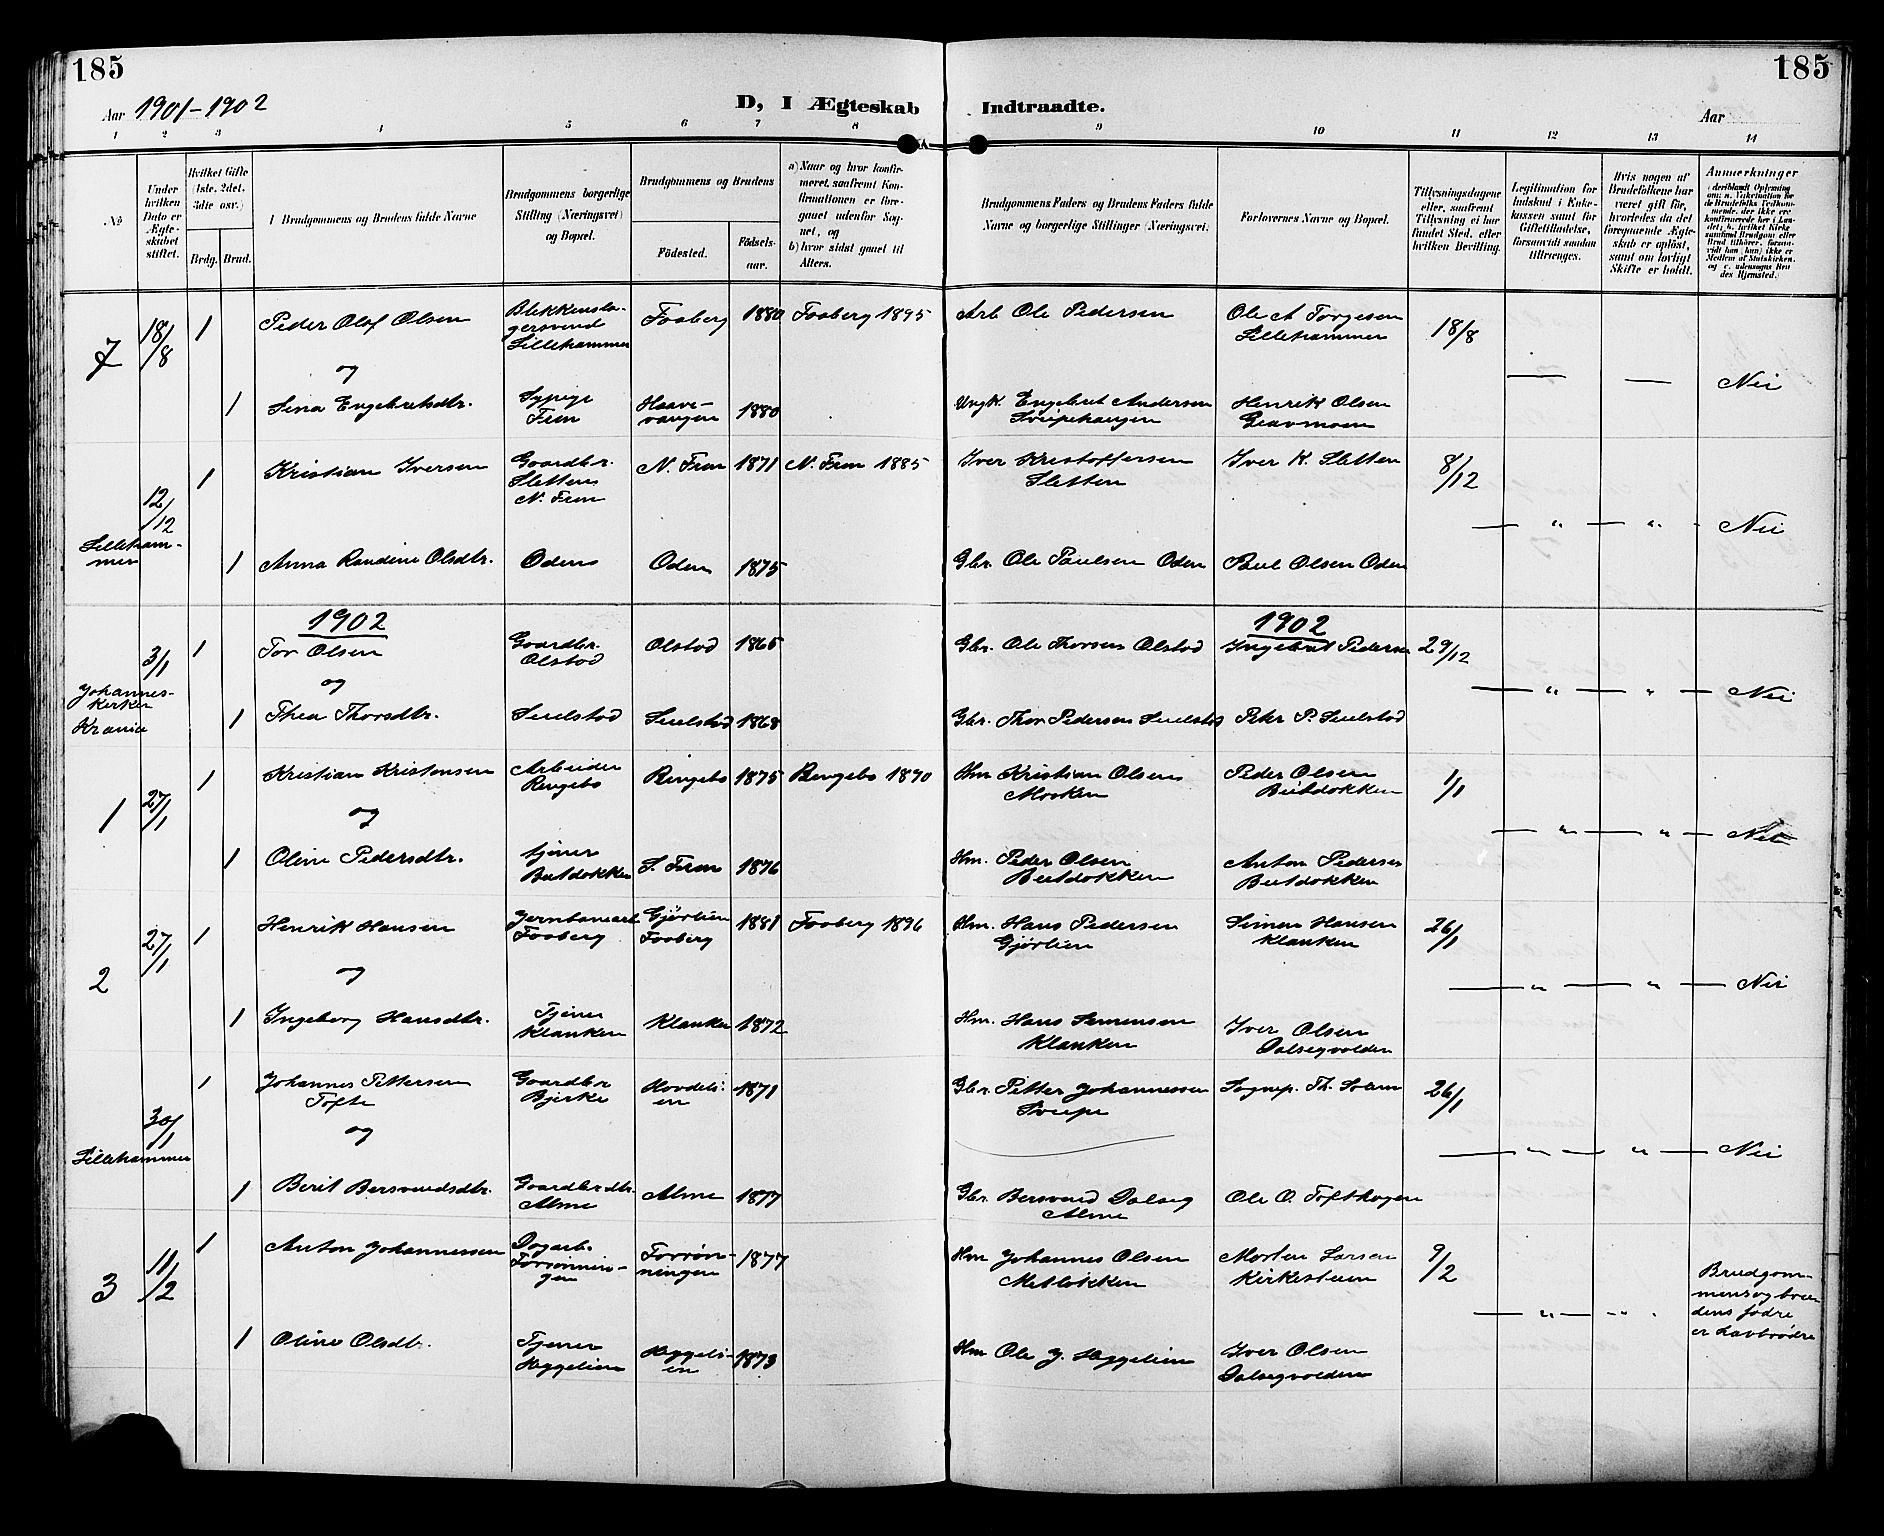 SAH, Sør-Fron prestekontor, H/Ha/Hab/L0004: Klokkerbok nr. 4, 1896-1911, s. 185